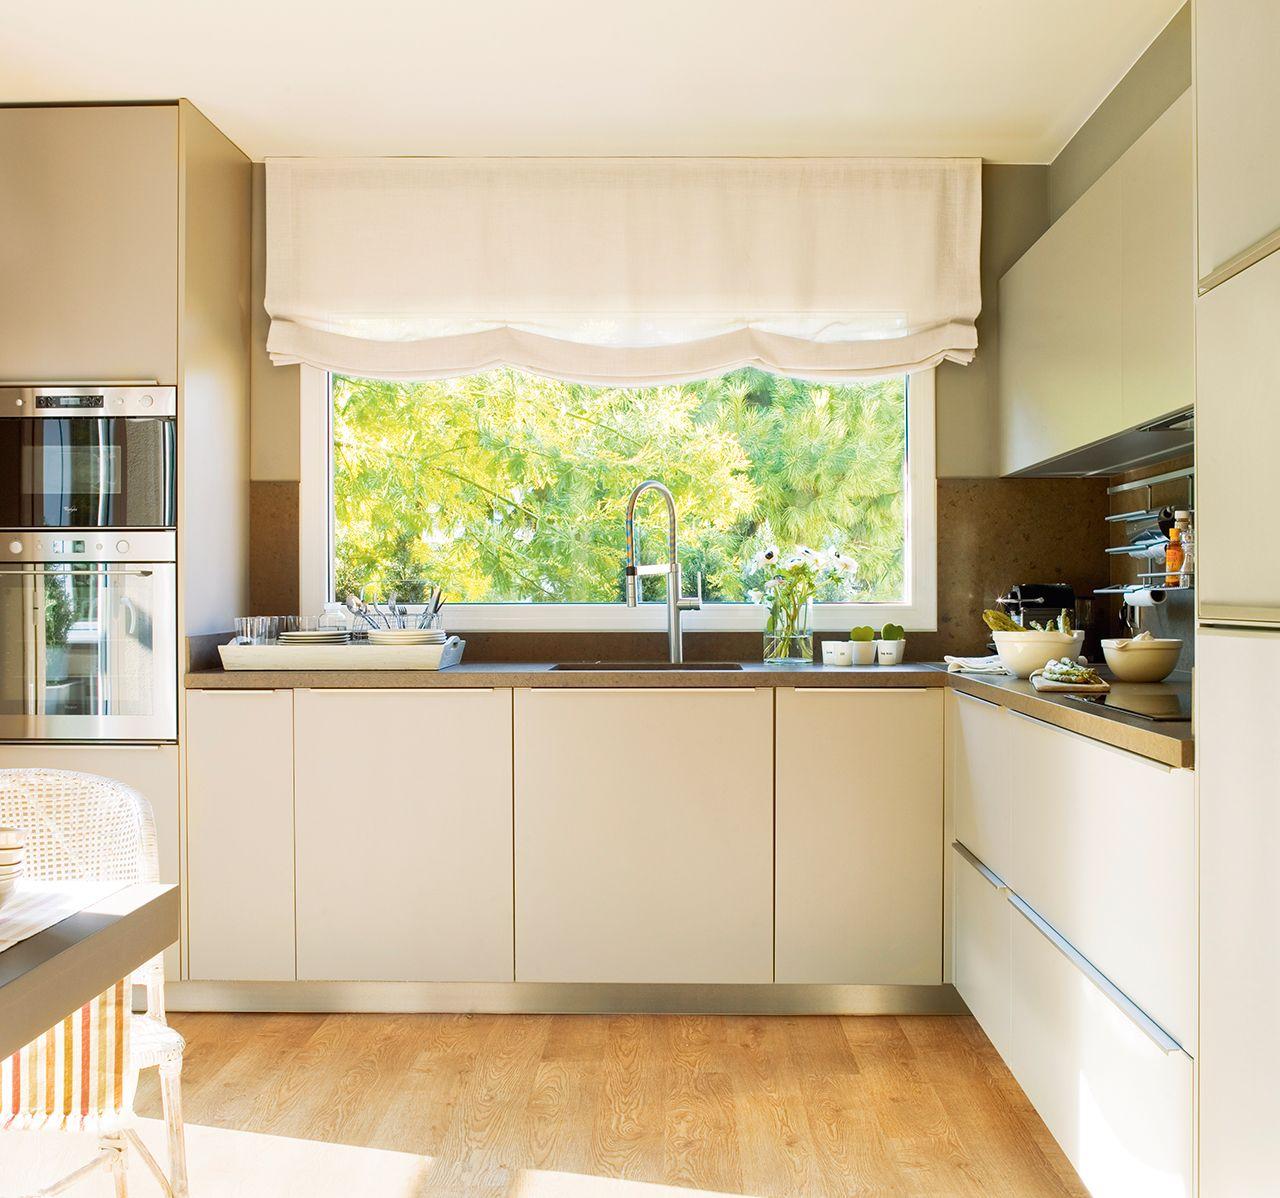 Ideas de decoración para cocinas pequeñas | cocinas | Pinterest ...